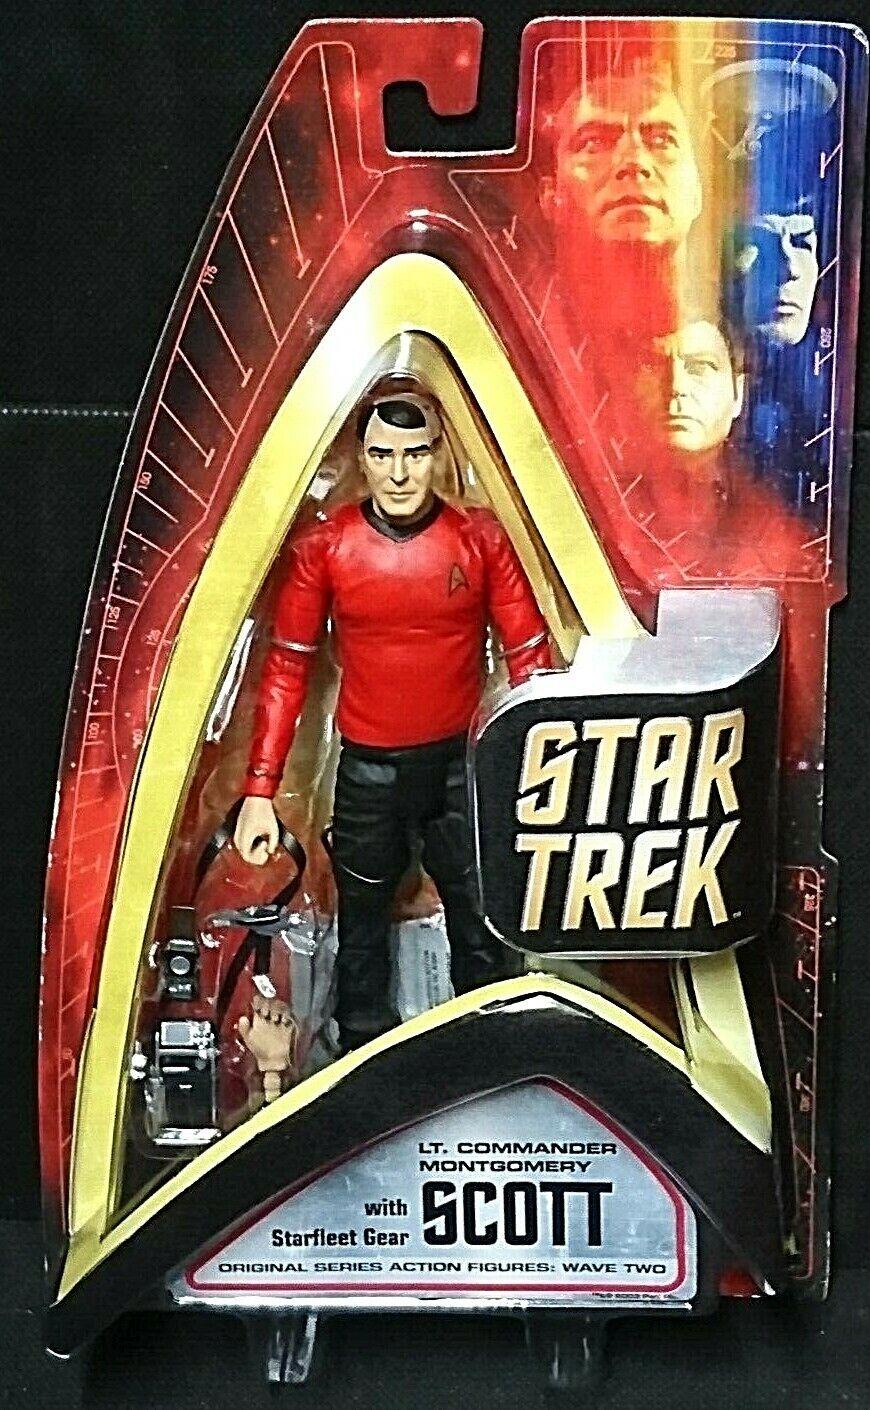 Star Trek Original Series Wave Two LT. COMMANDER SCOTT Art Asylum James Doohan